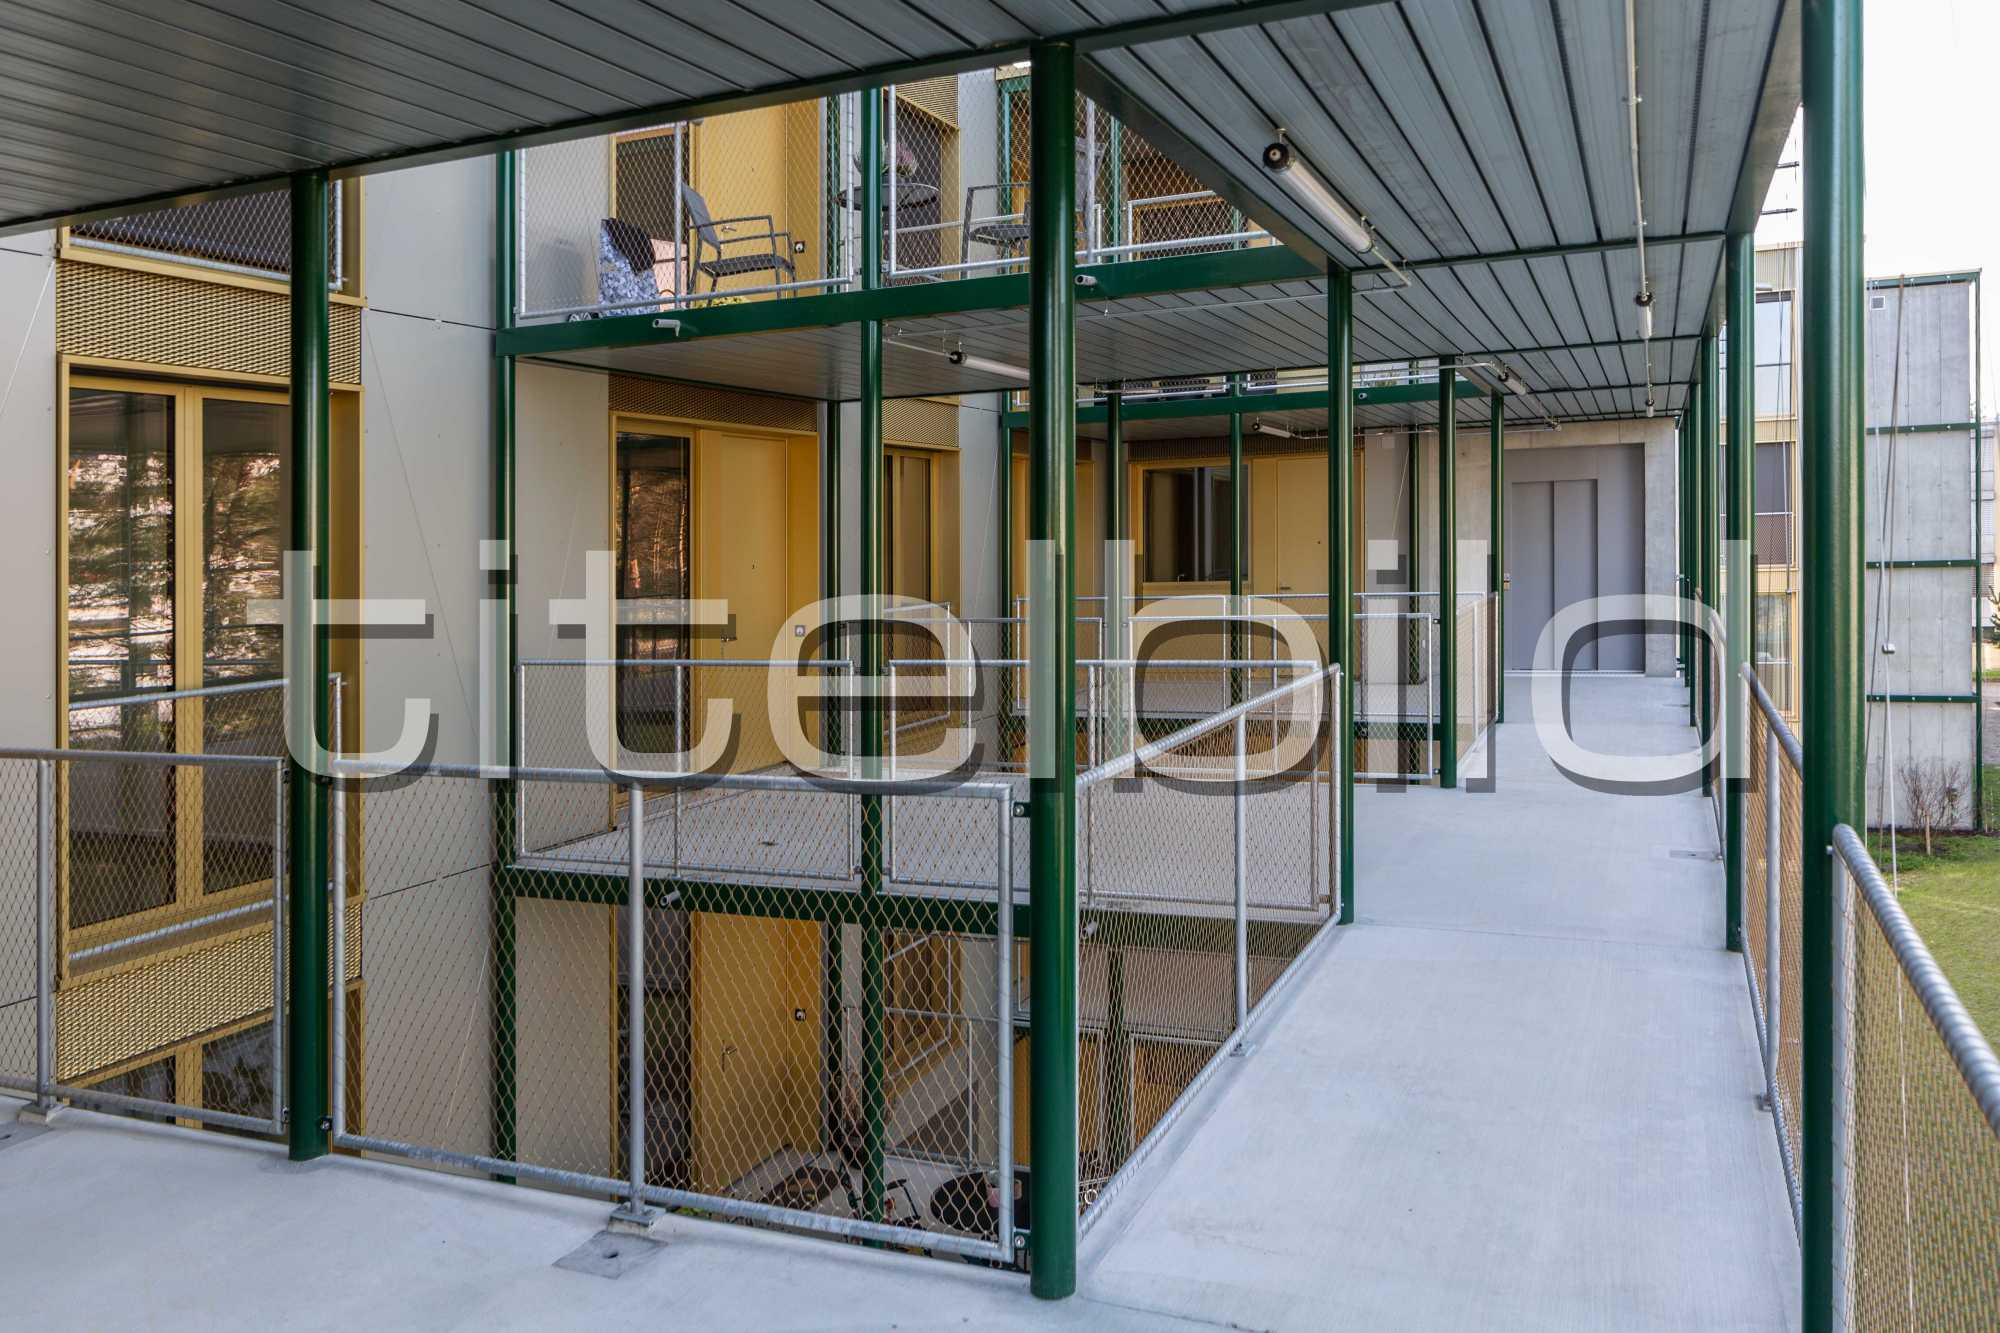 Projektbild-Nr. 6: Quattro Sorelle, Bülach